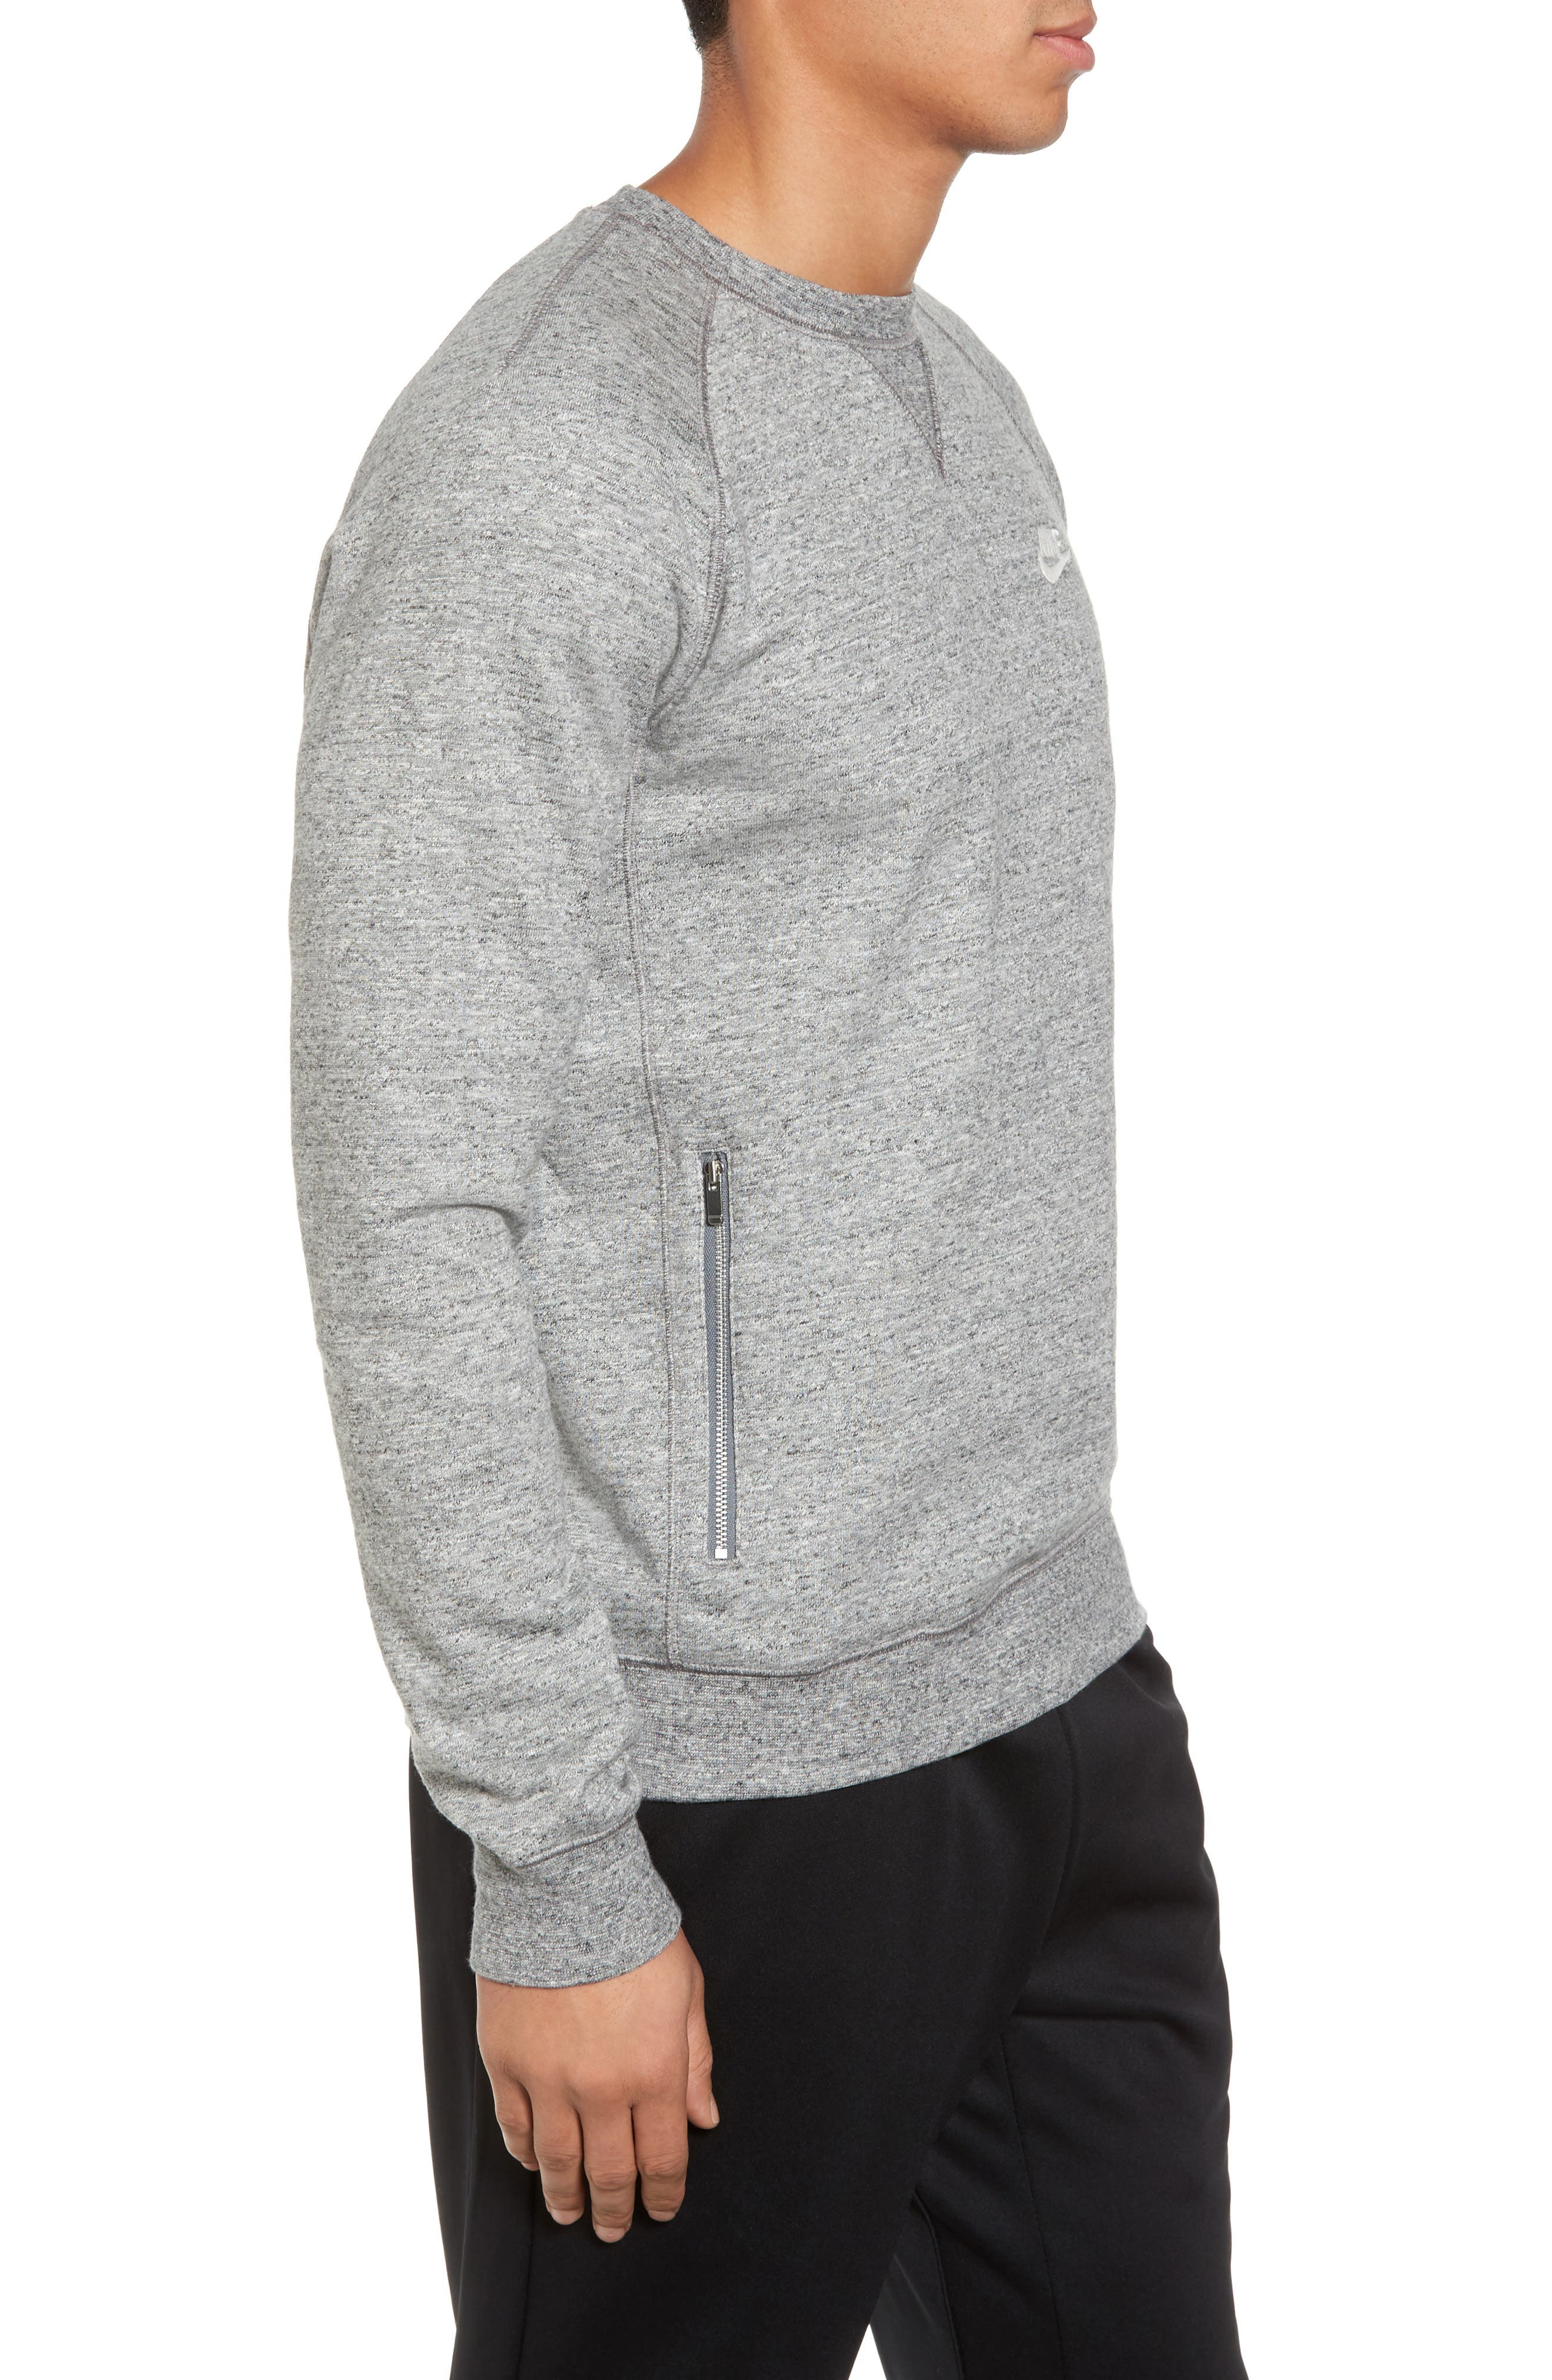 Legacy Raglan Crewneck Sweatshirt,                             Alternate thumbnail 3, color,                             092